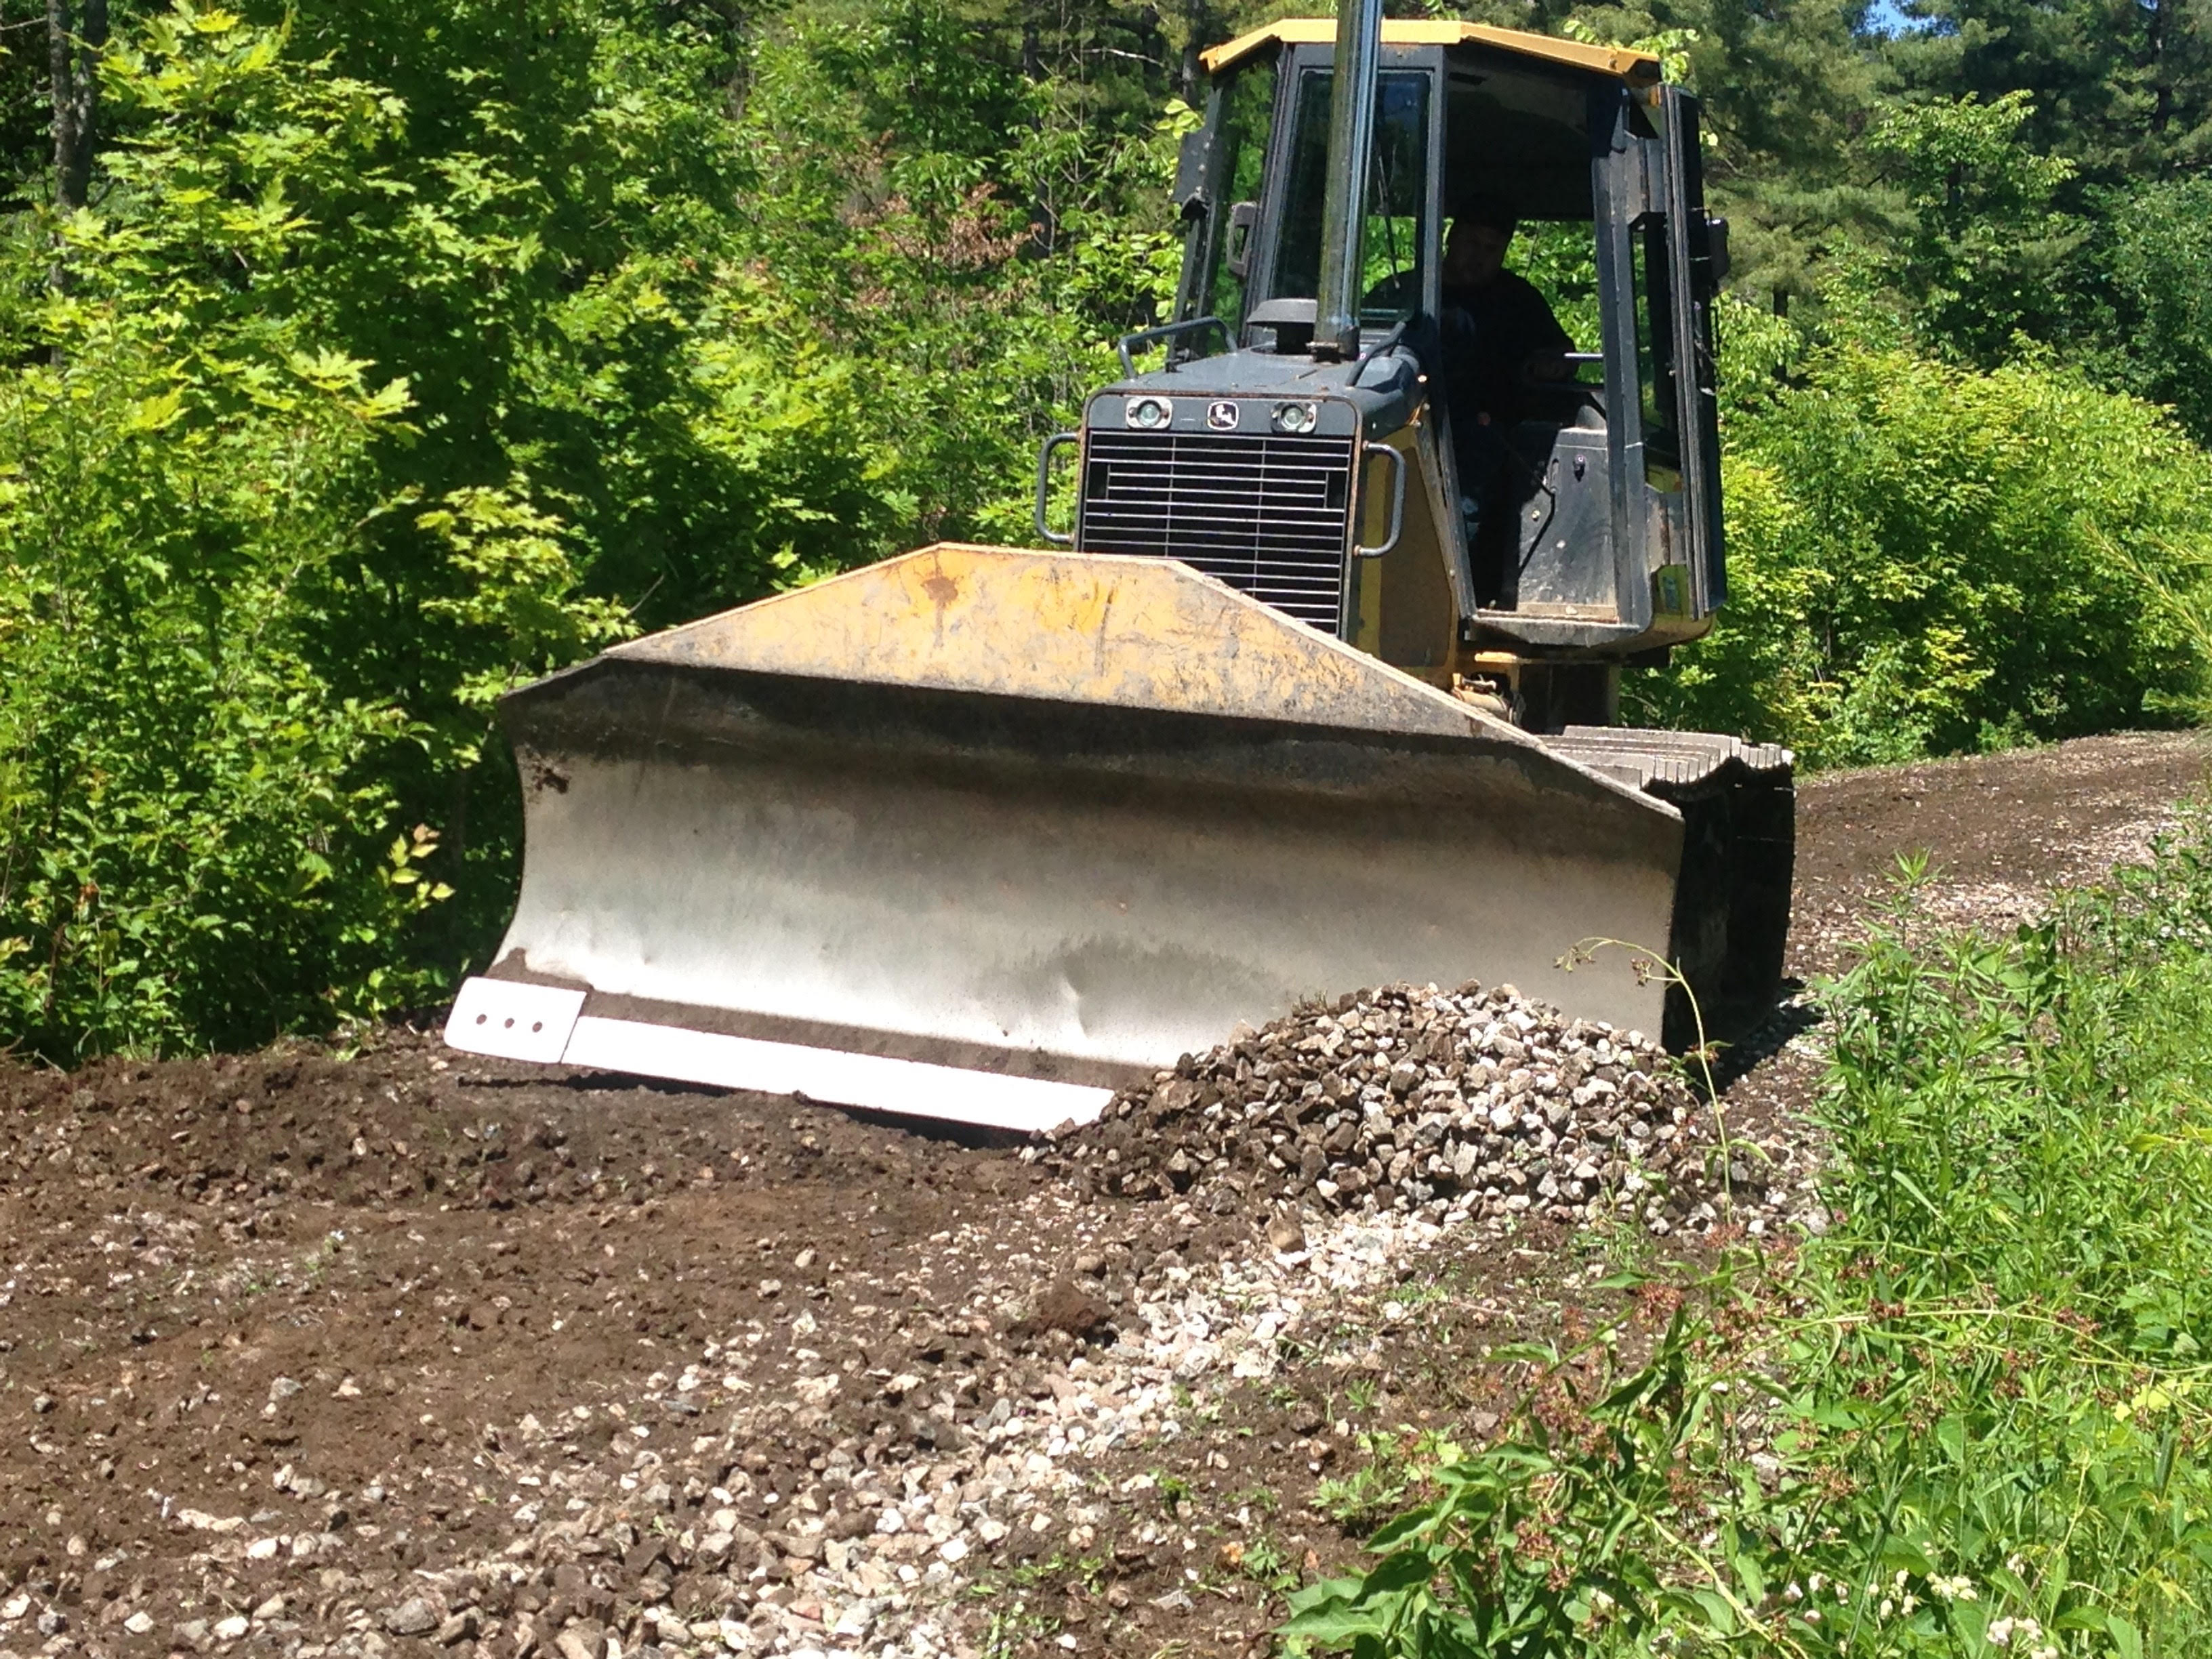 2018-06-01 bulldozer on community rail trail